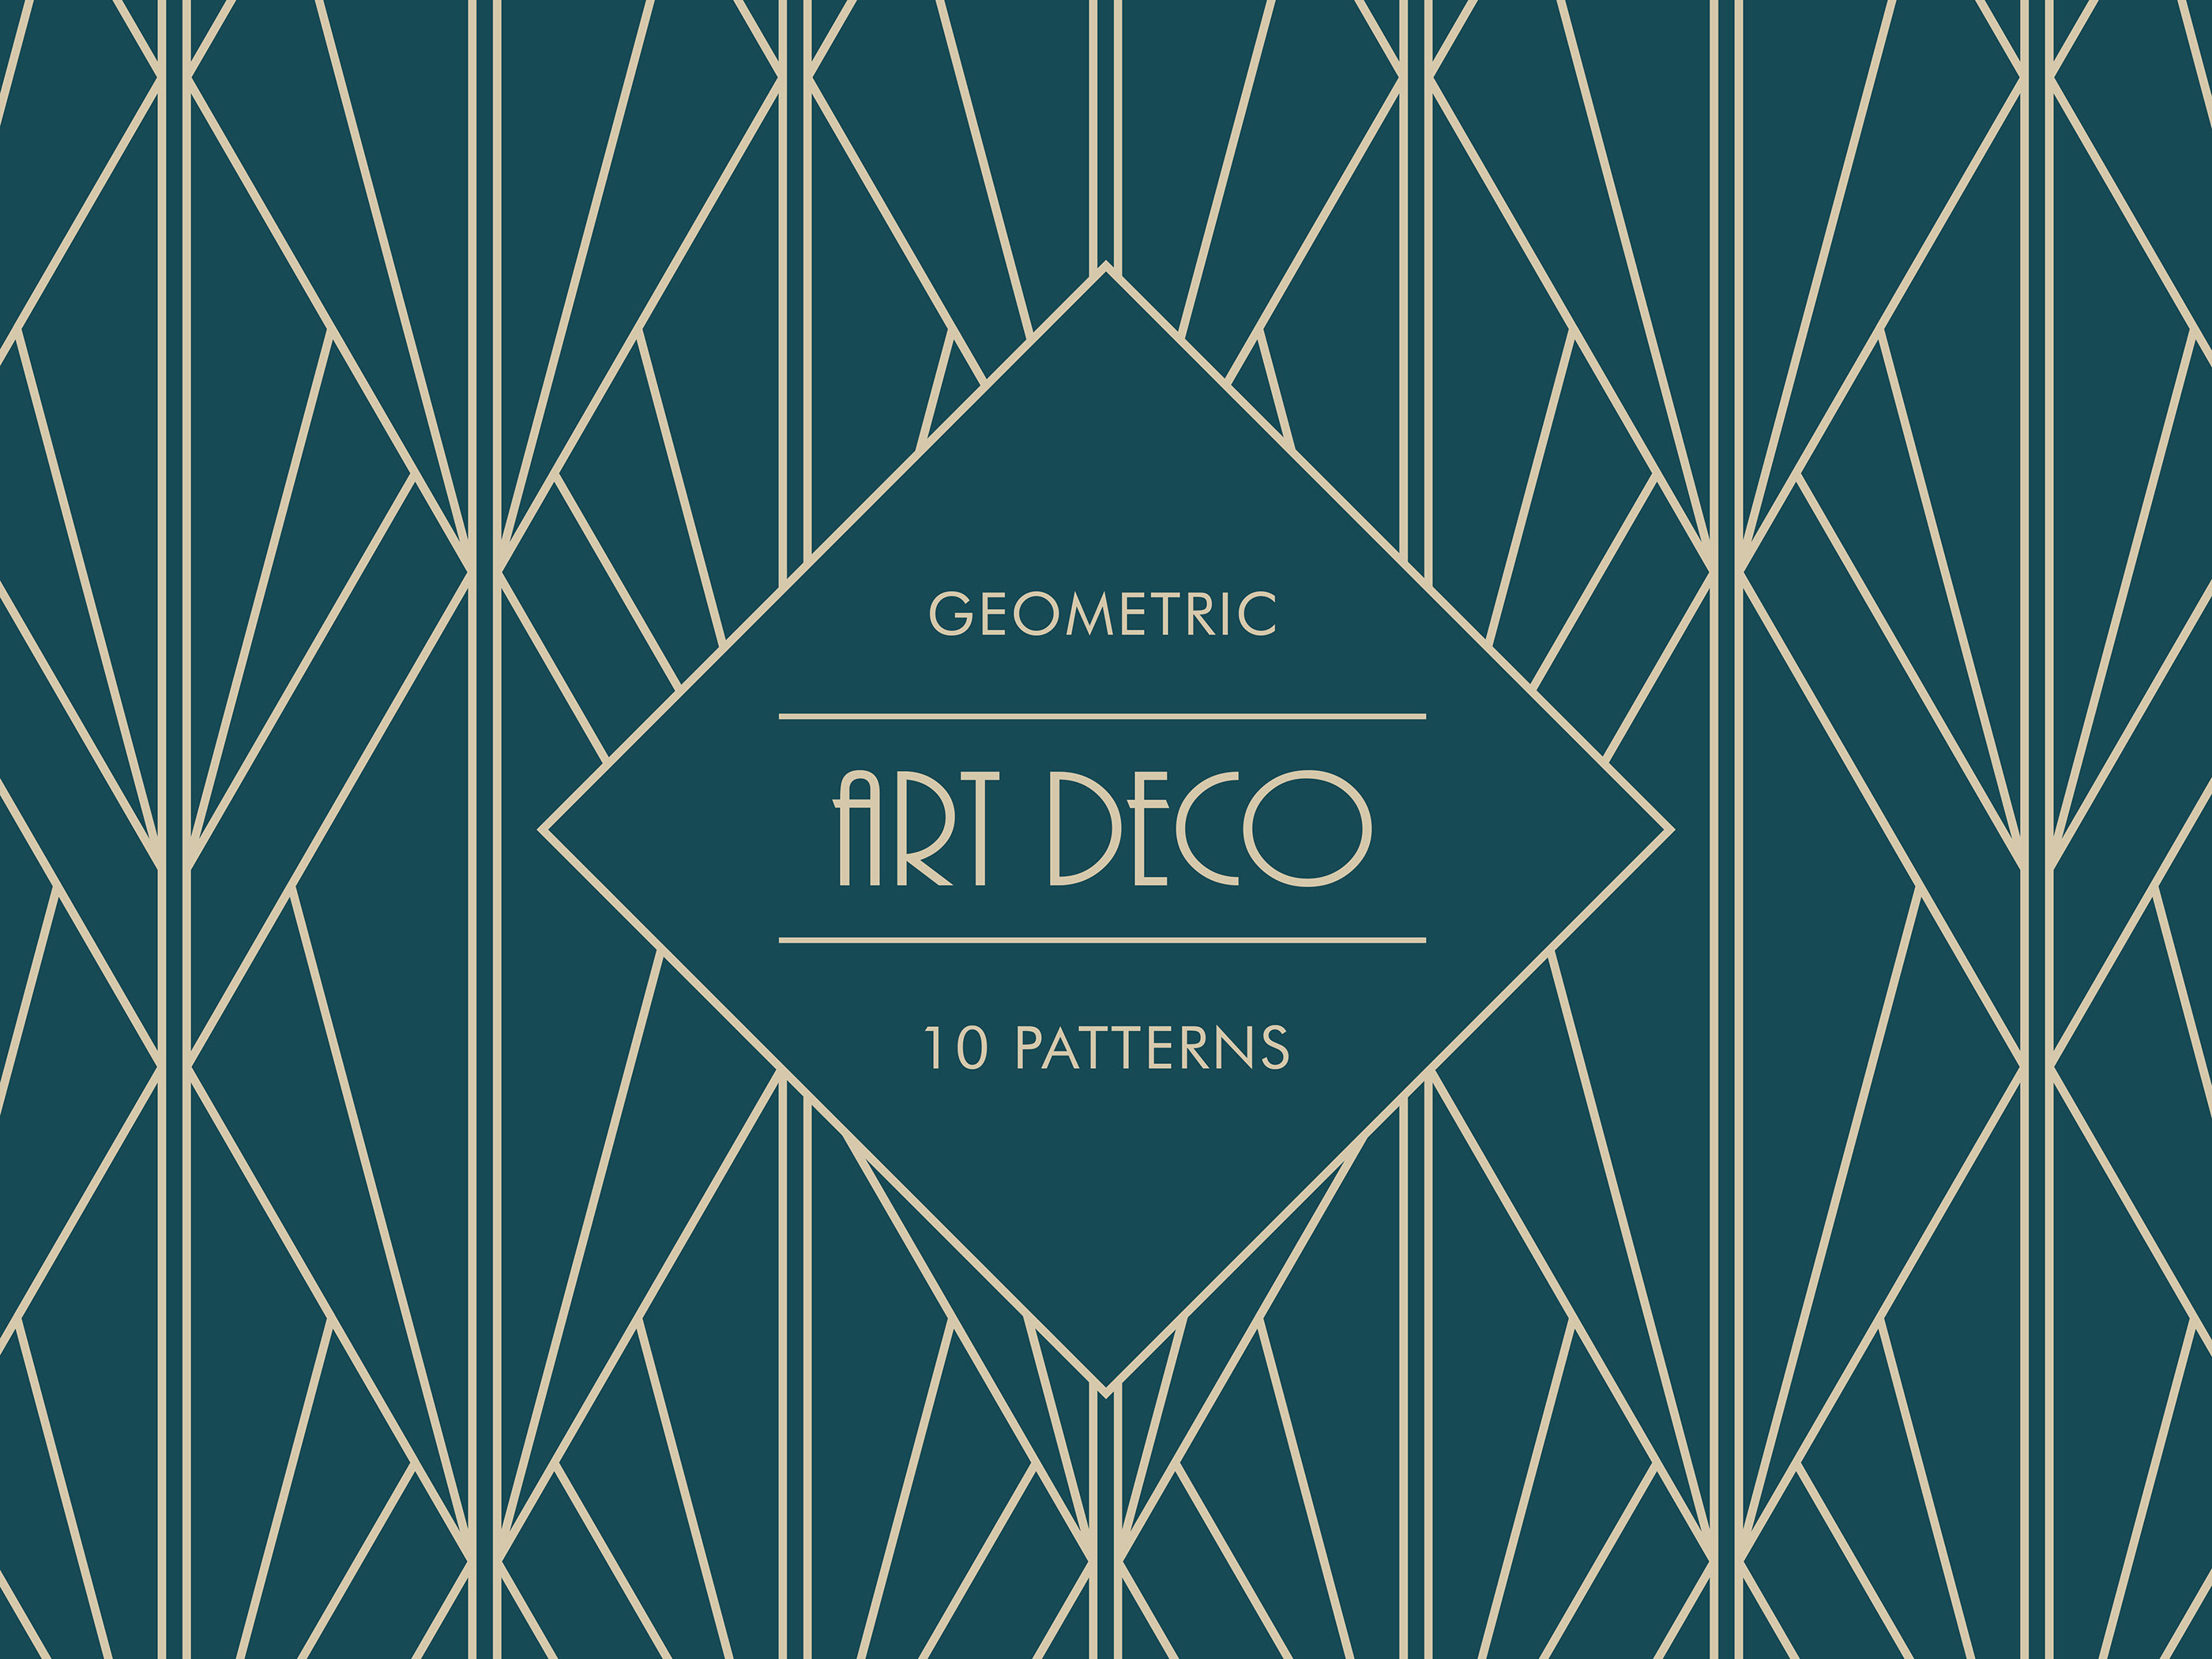 Free Download Art Deco Geometric Patterns On Behance